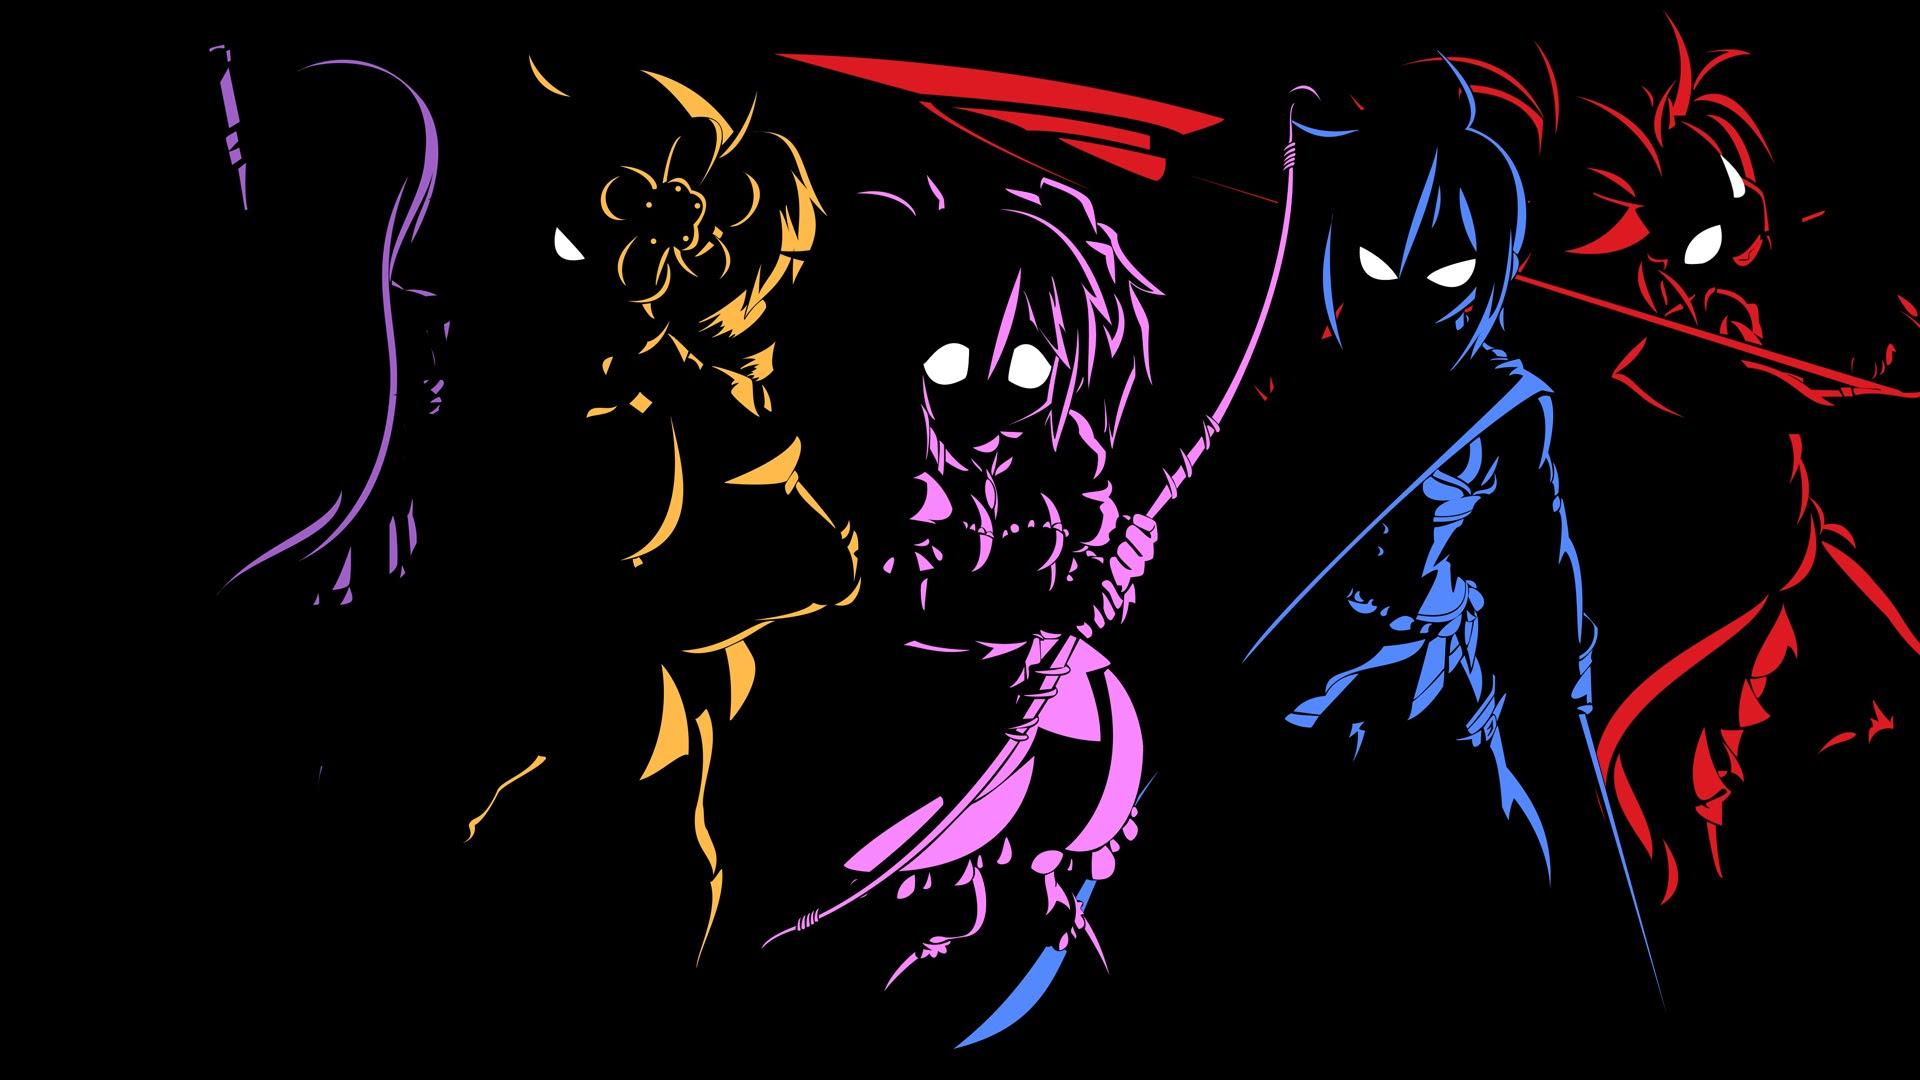 Black Anime Character 10 Background - Hdblackwallpaper.com